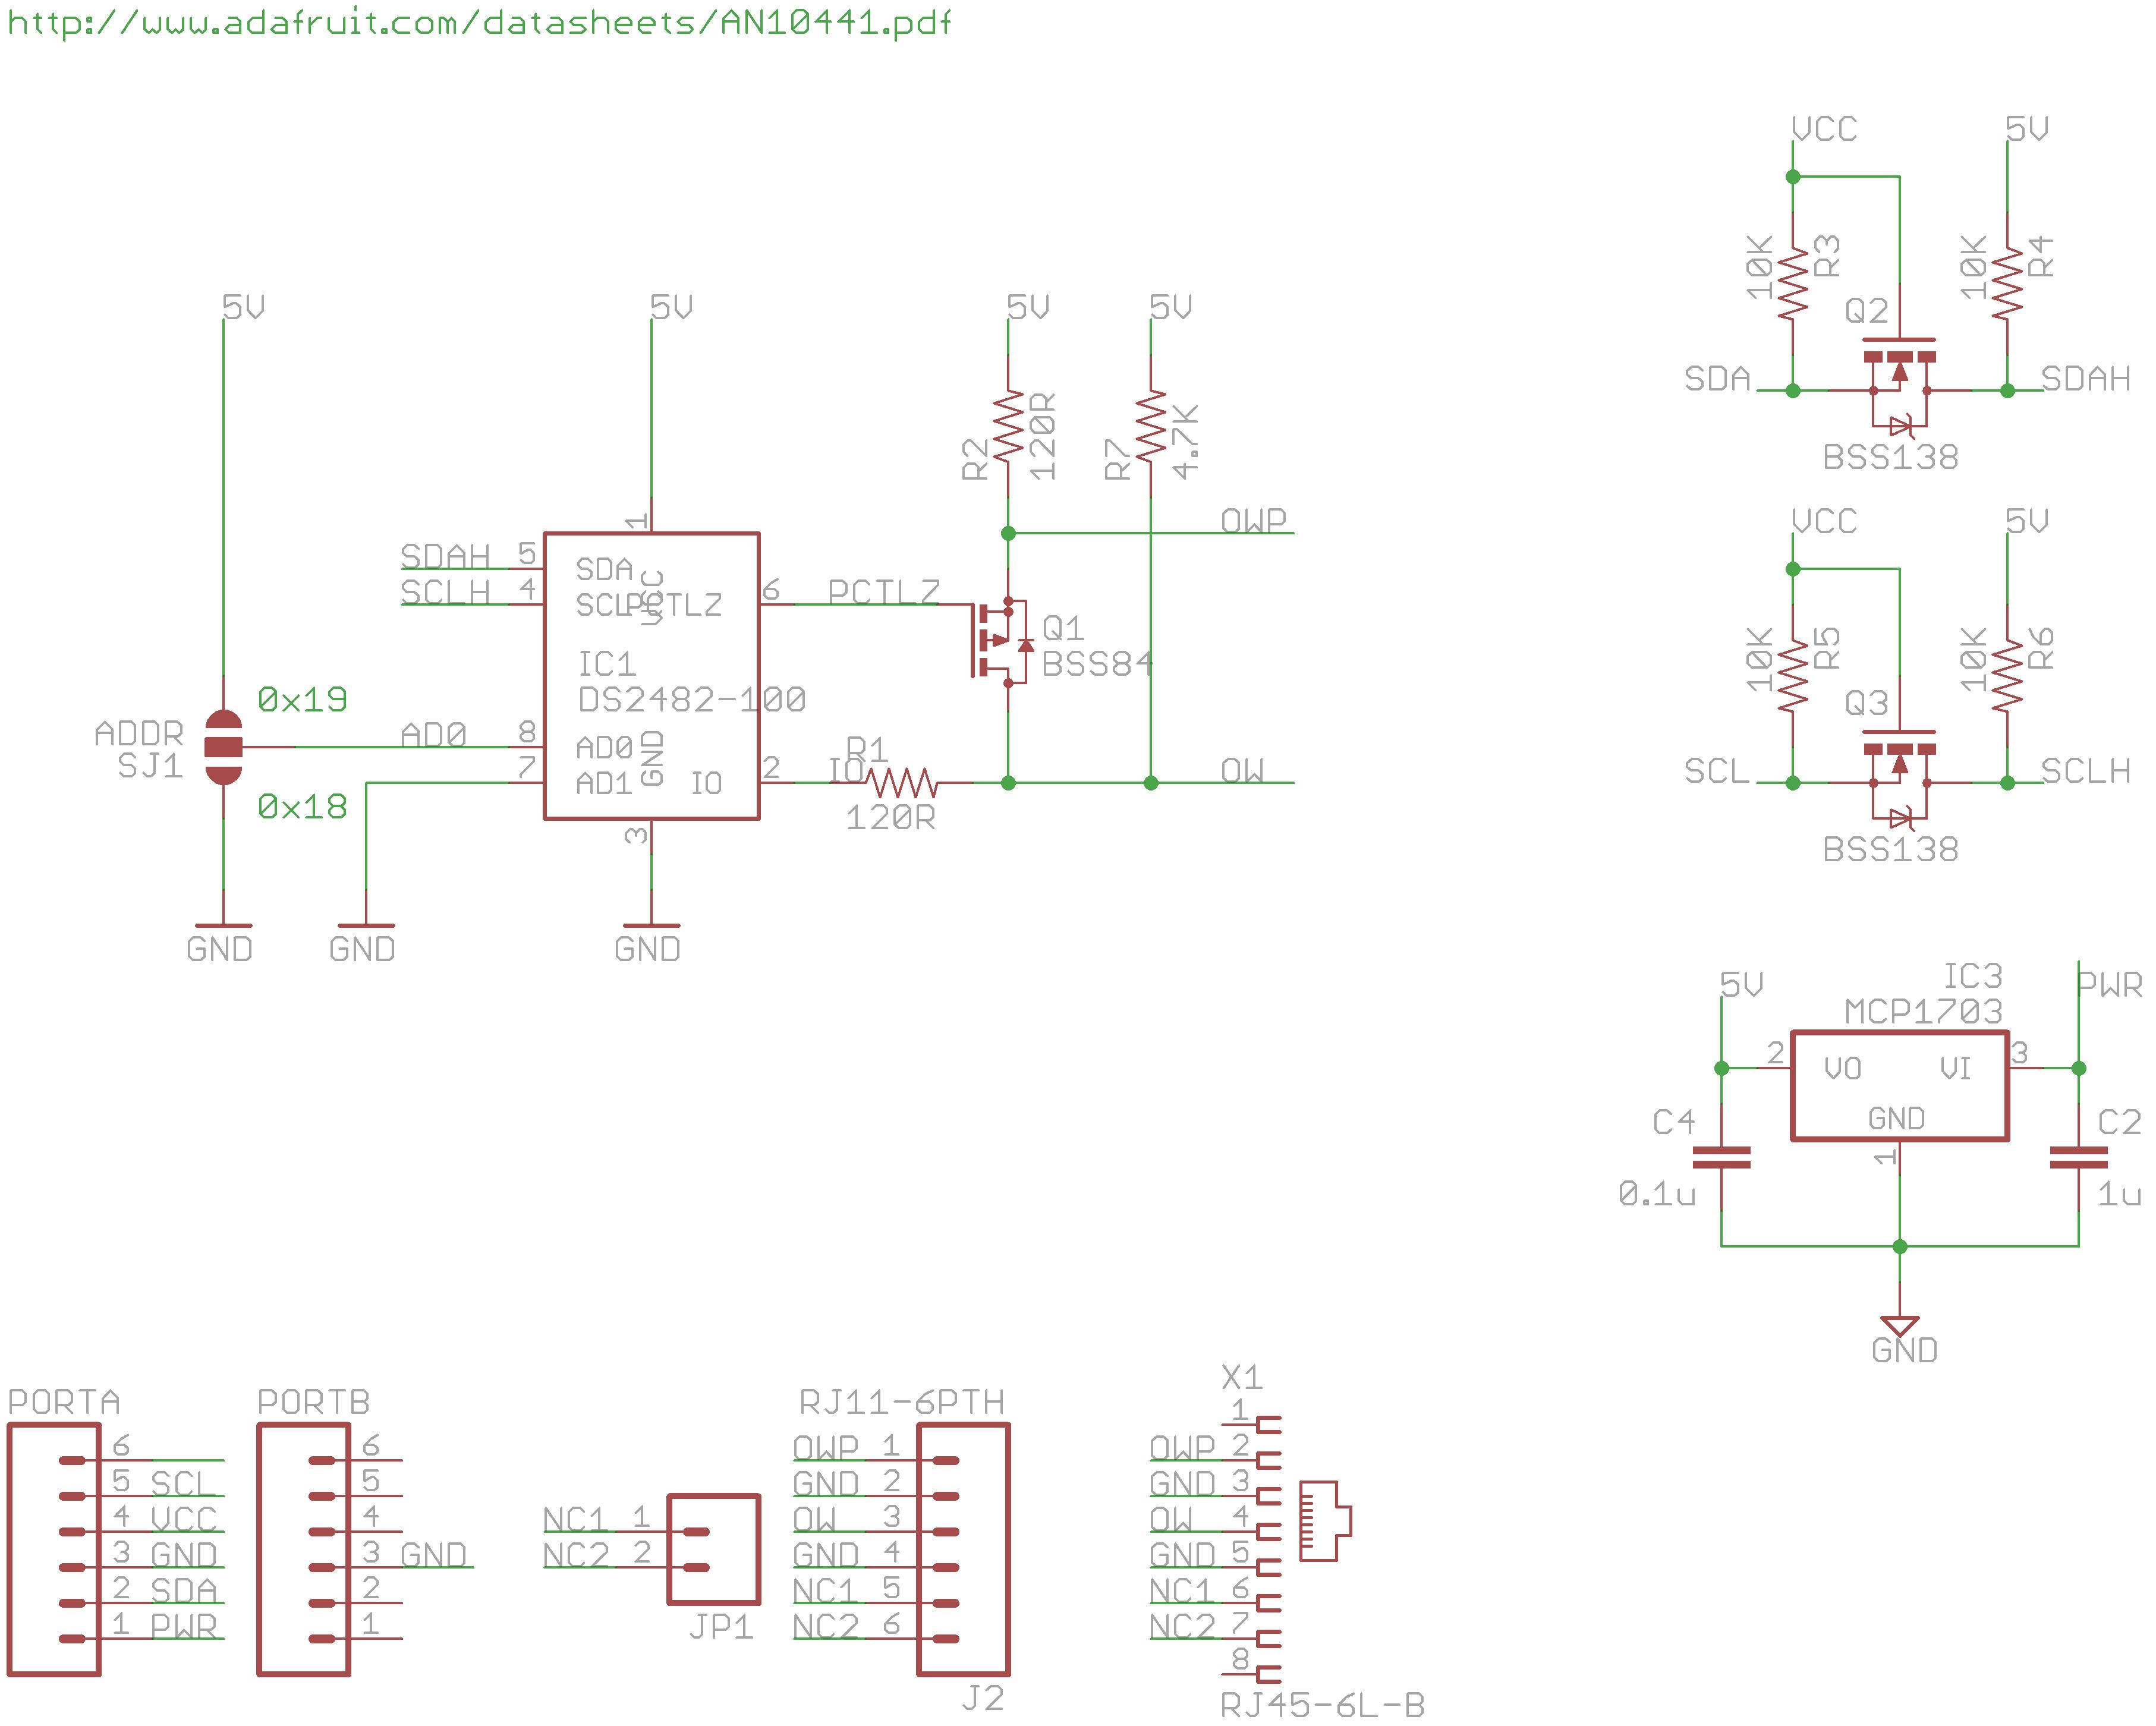 wiring 5v for plugs auto electrical wiring diagram u2022 rh 6weeks co uk